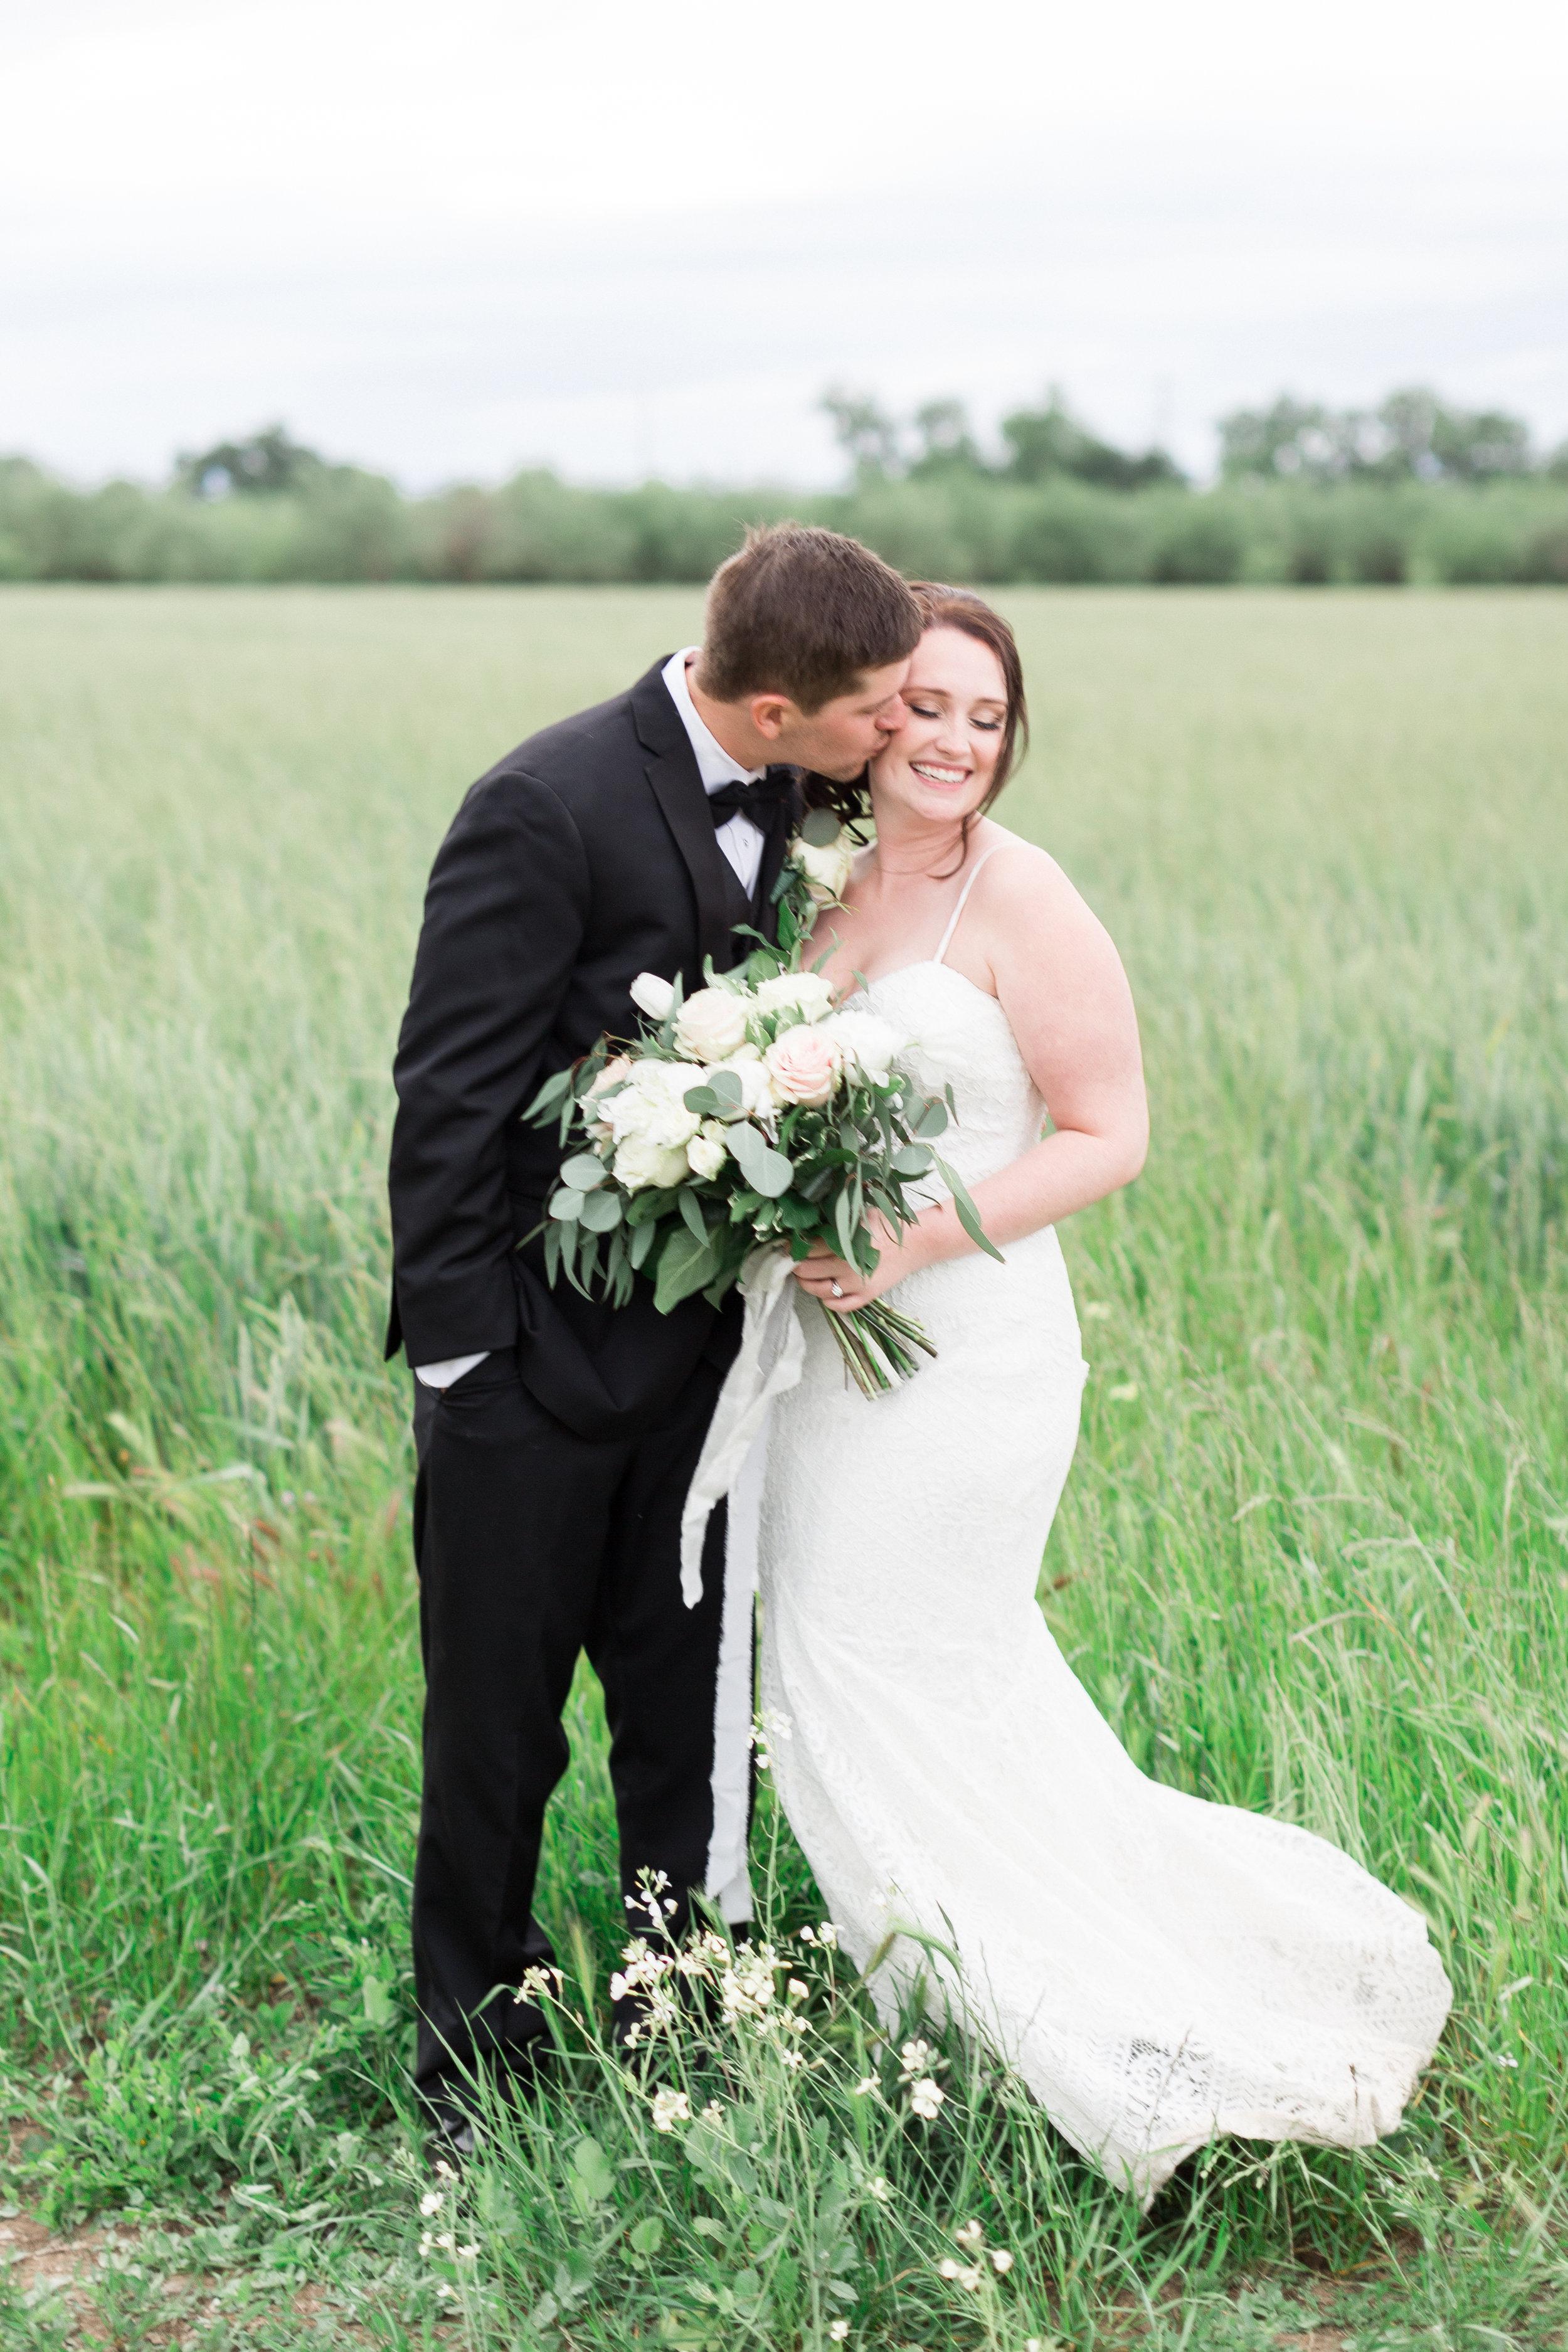 wedding-photographer-in-chico-cajpg